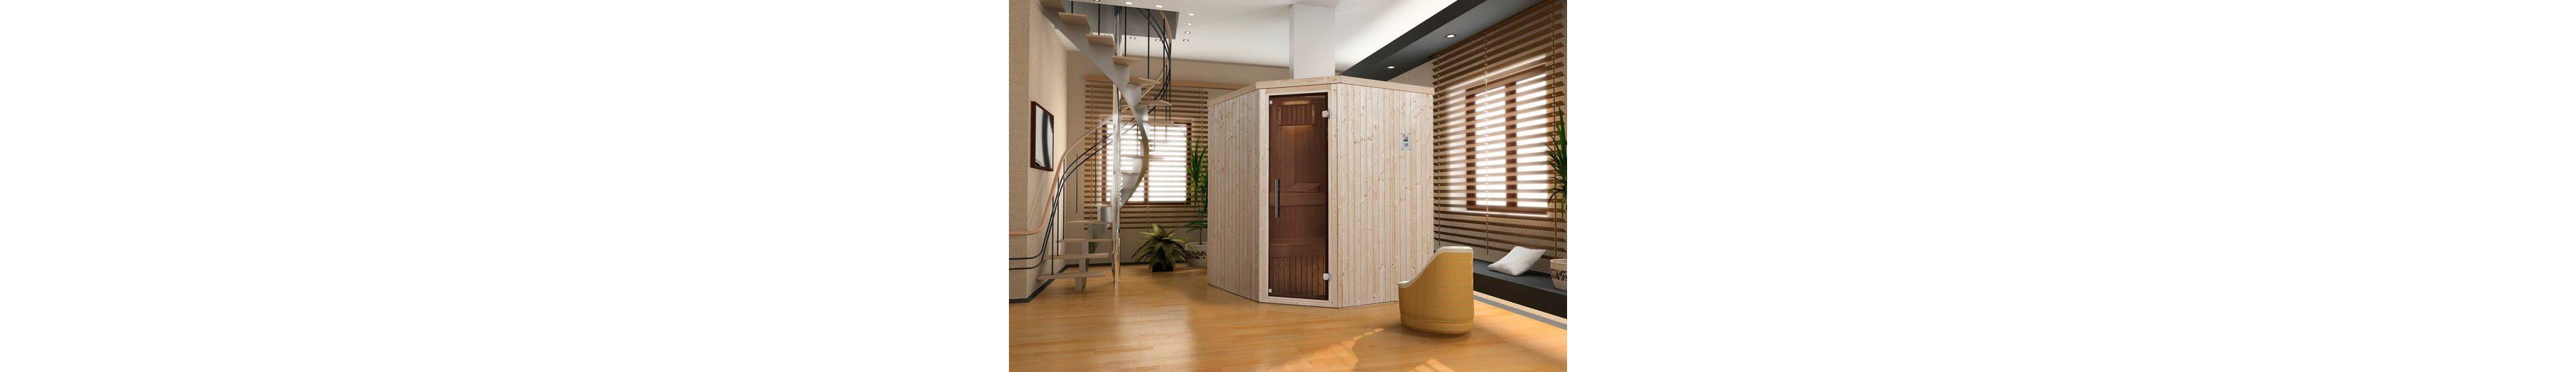 Sauna »Lyngdal 3 Trend Plus BioS«, 192/175/199 cm, 68 mm, 7,5-KW-Bio-Kombiofen